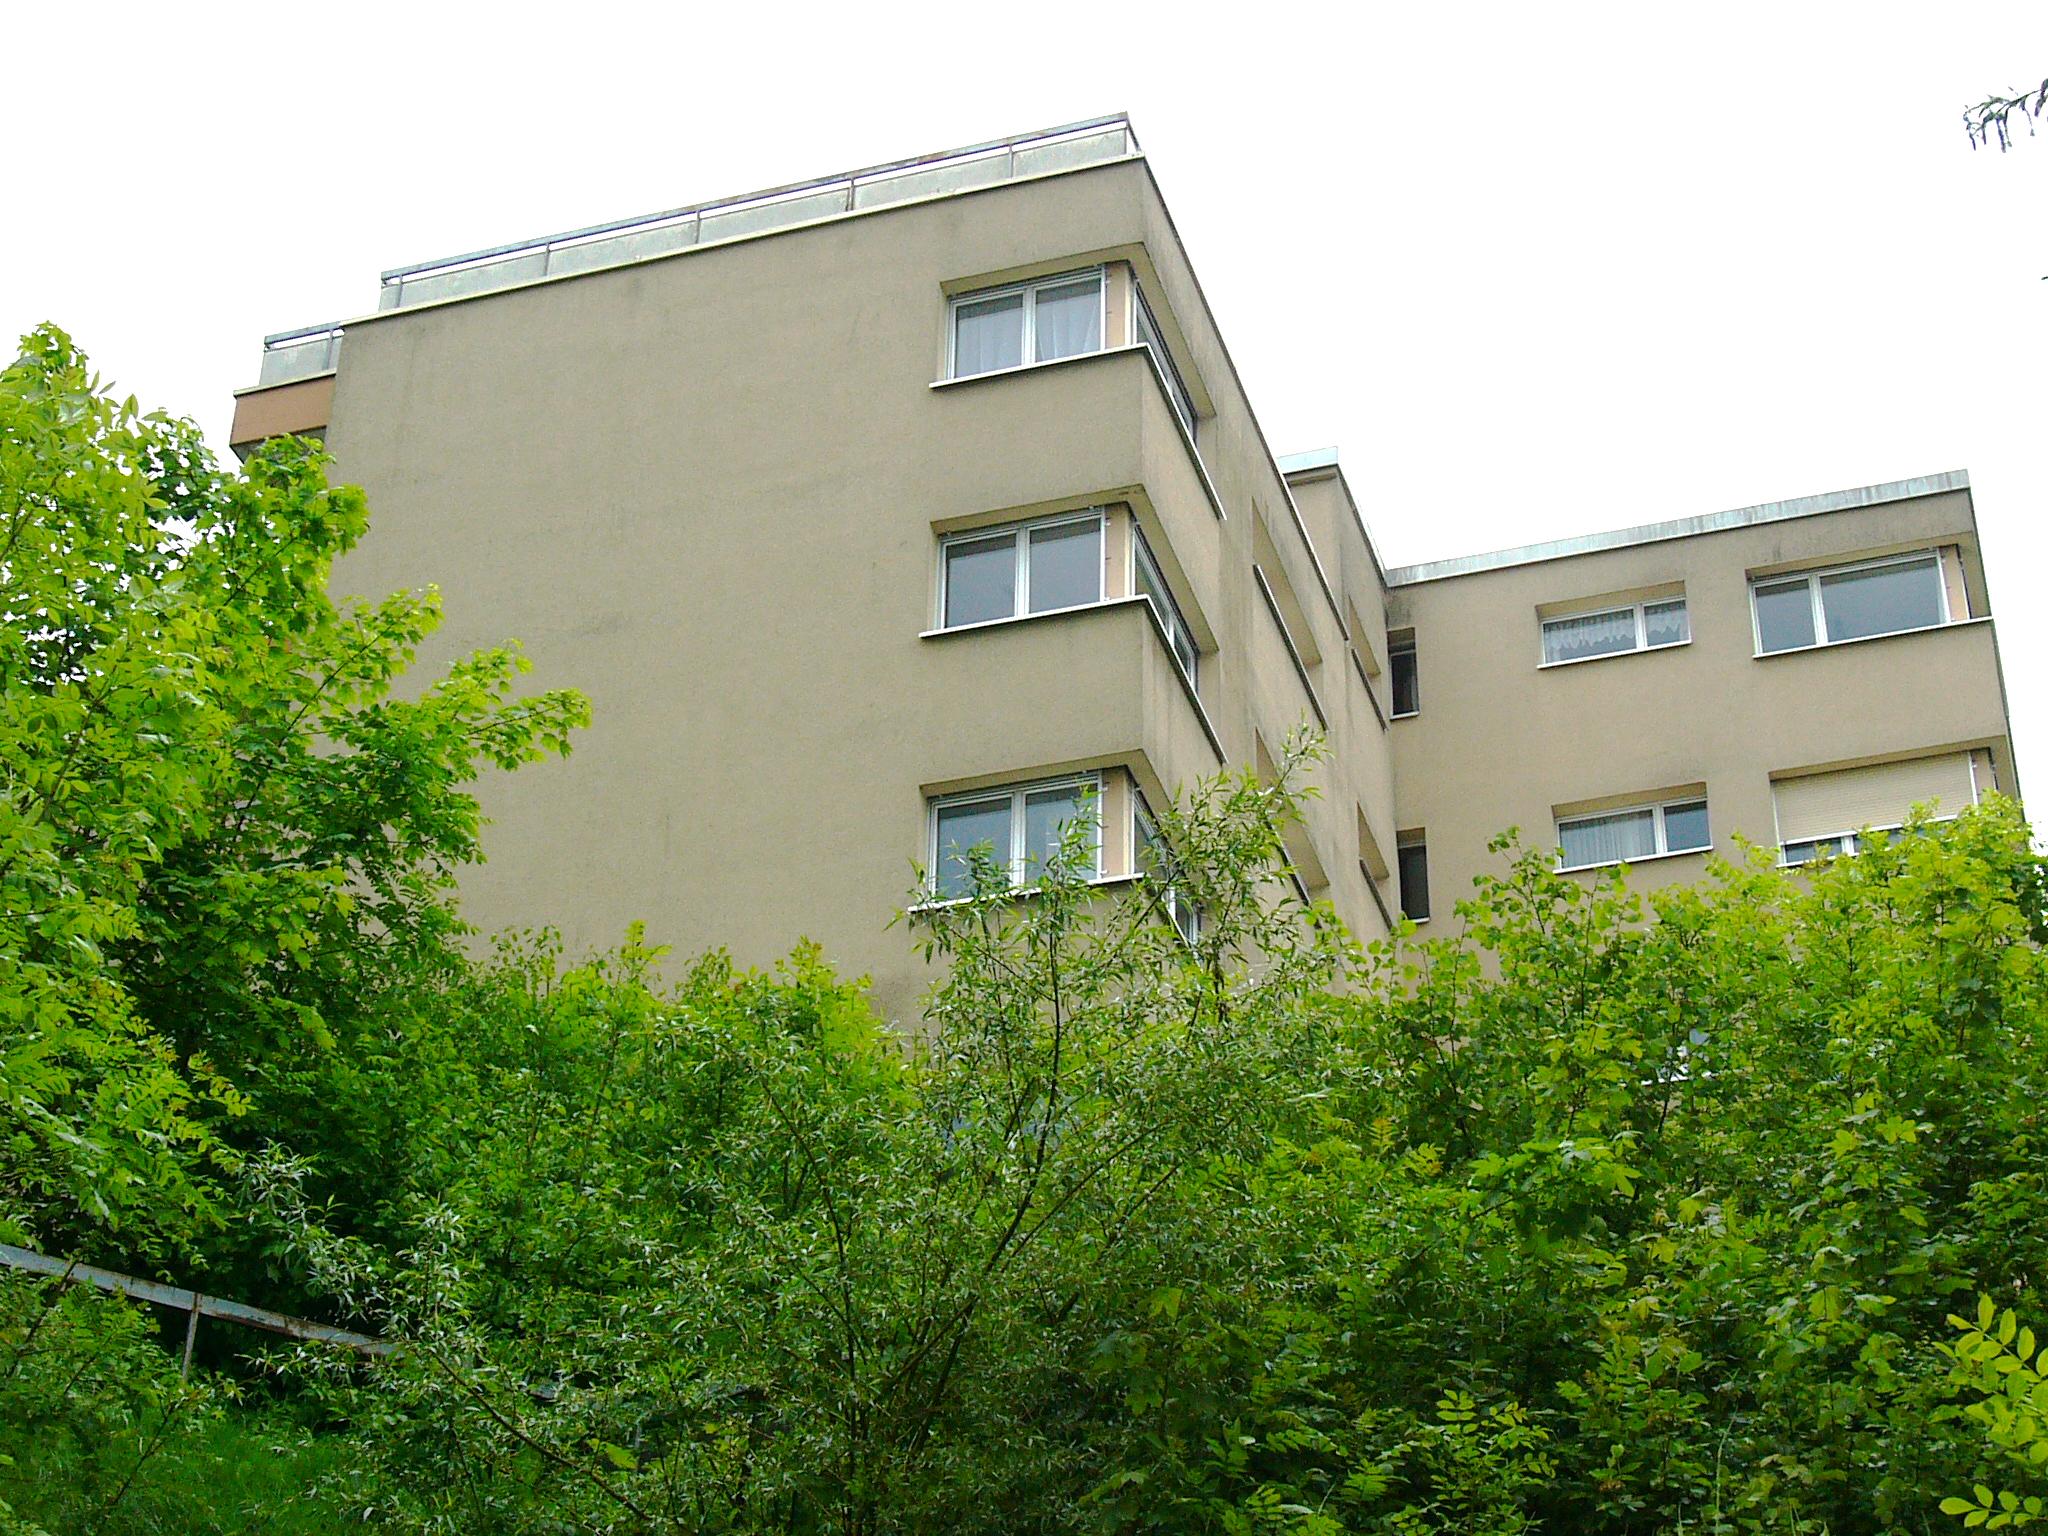 12-Familienhaus in Heiden